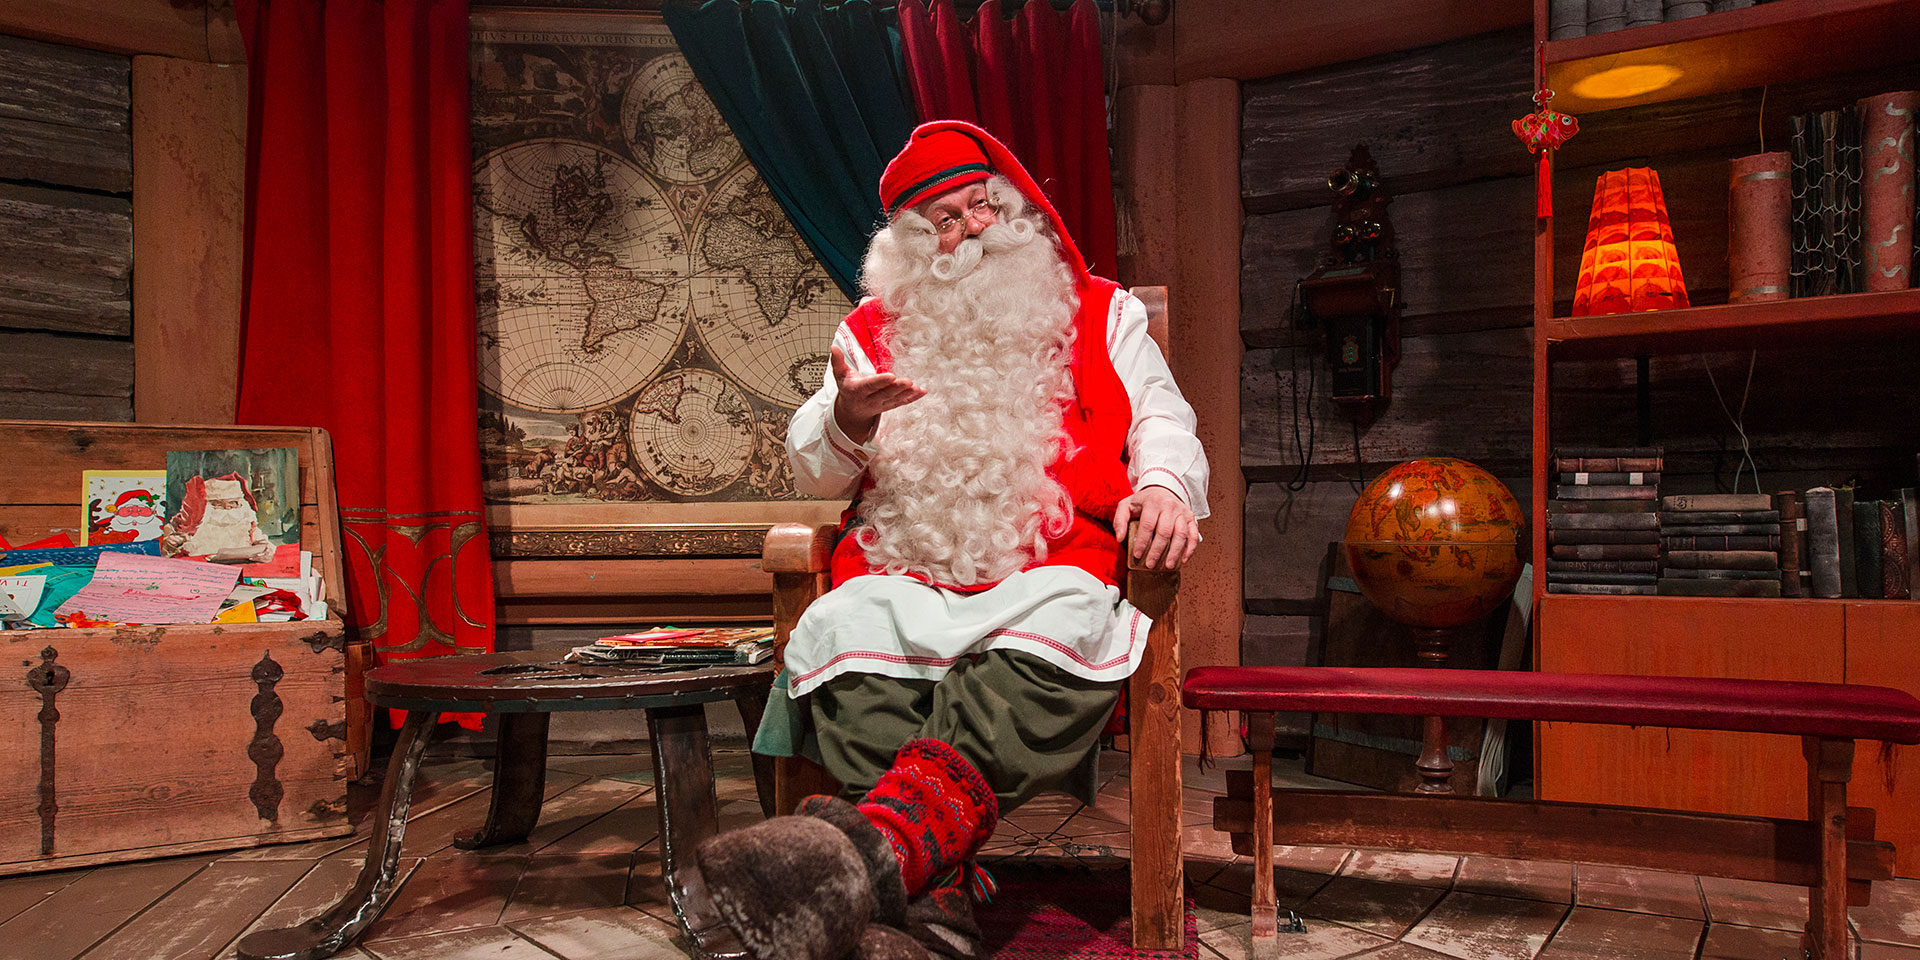 visit-rovaniemi-faq-ask-us-santa-claus-office-web-opt-1920x960.jpg